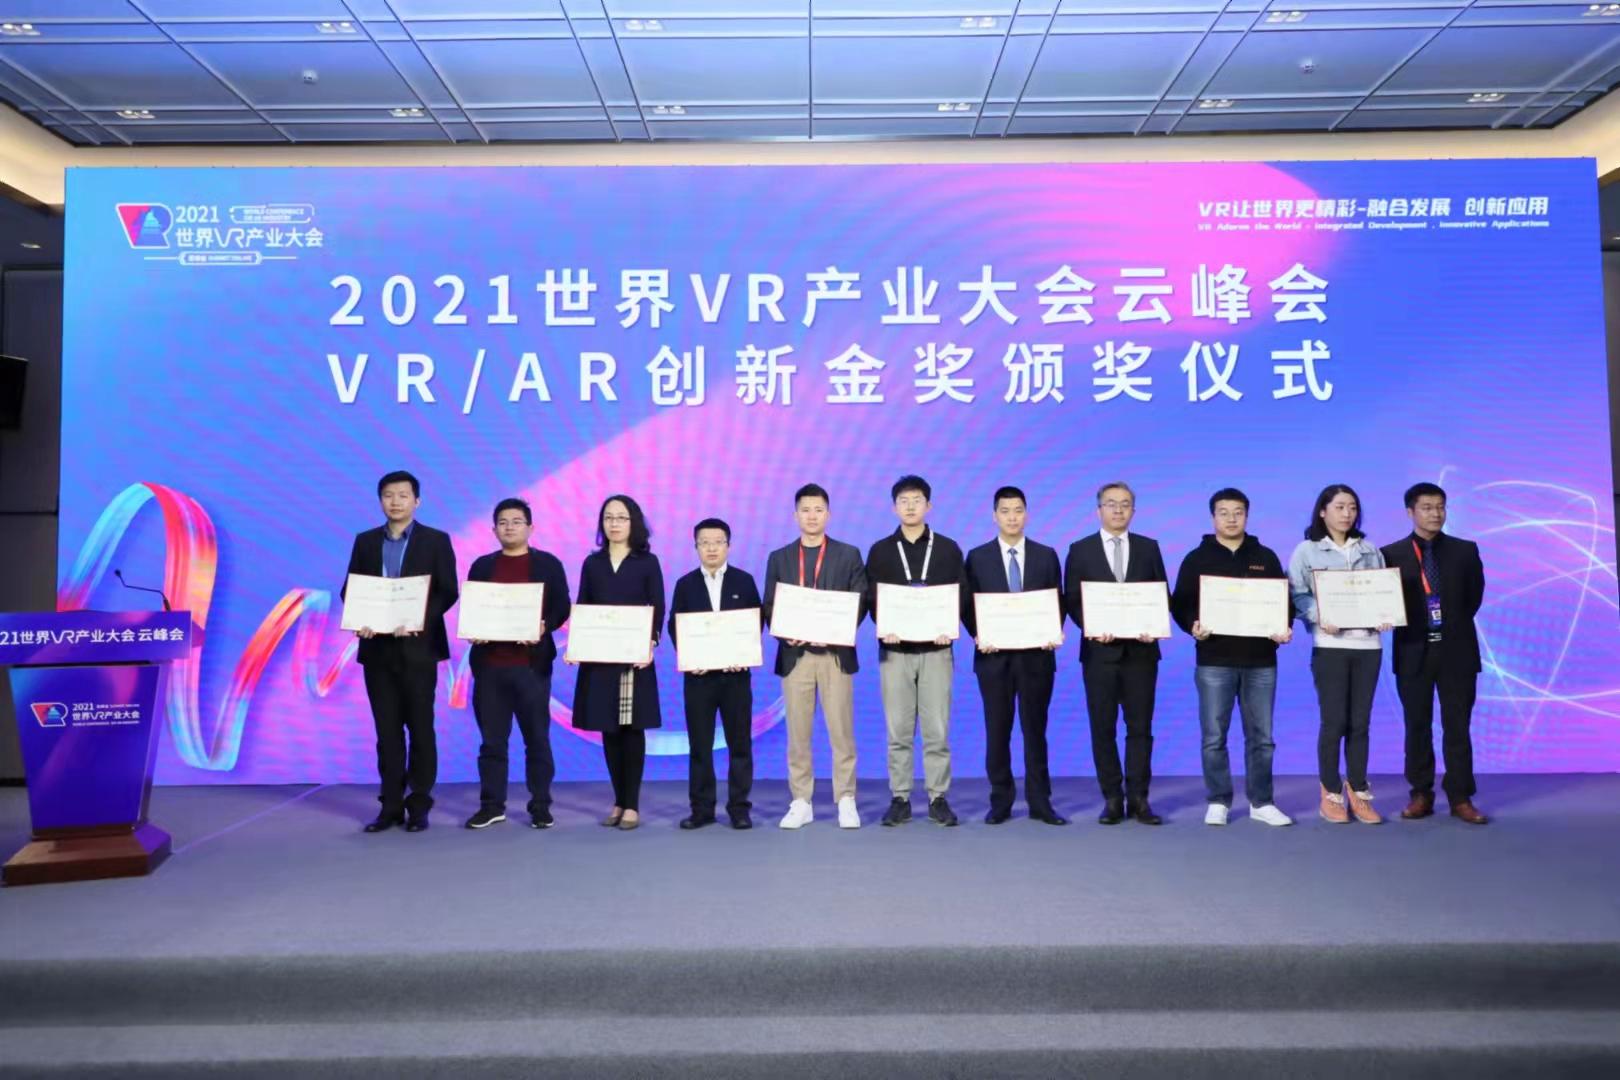 NOLO亮相2021世界VR大会,展望三千兆网络时代下机遇